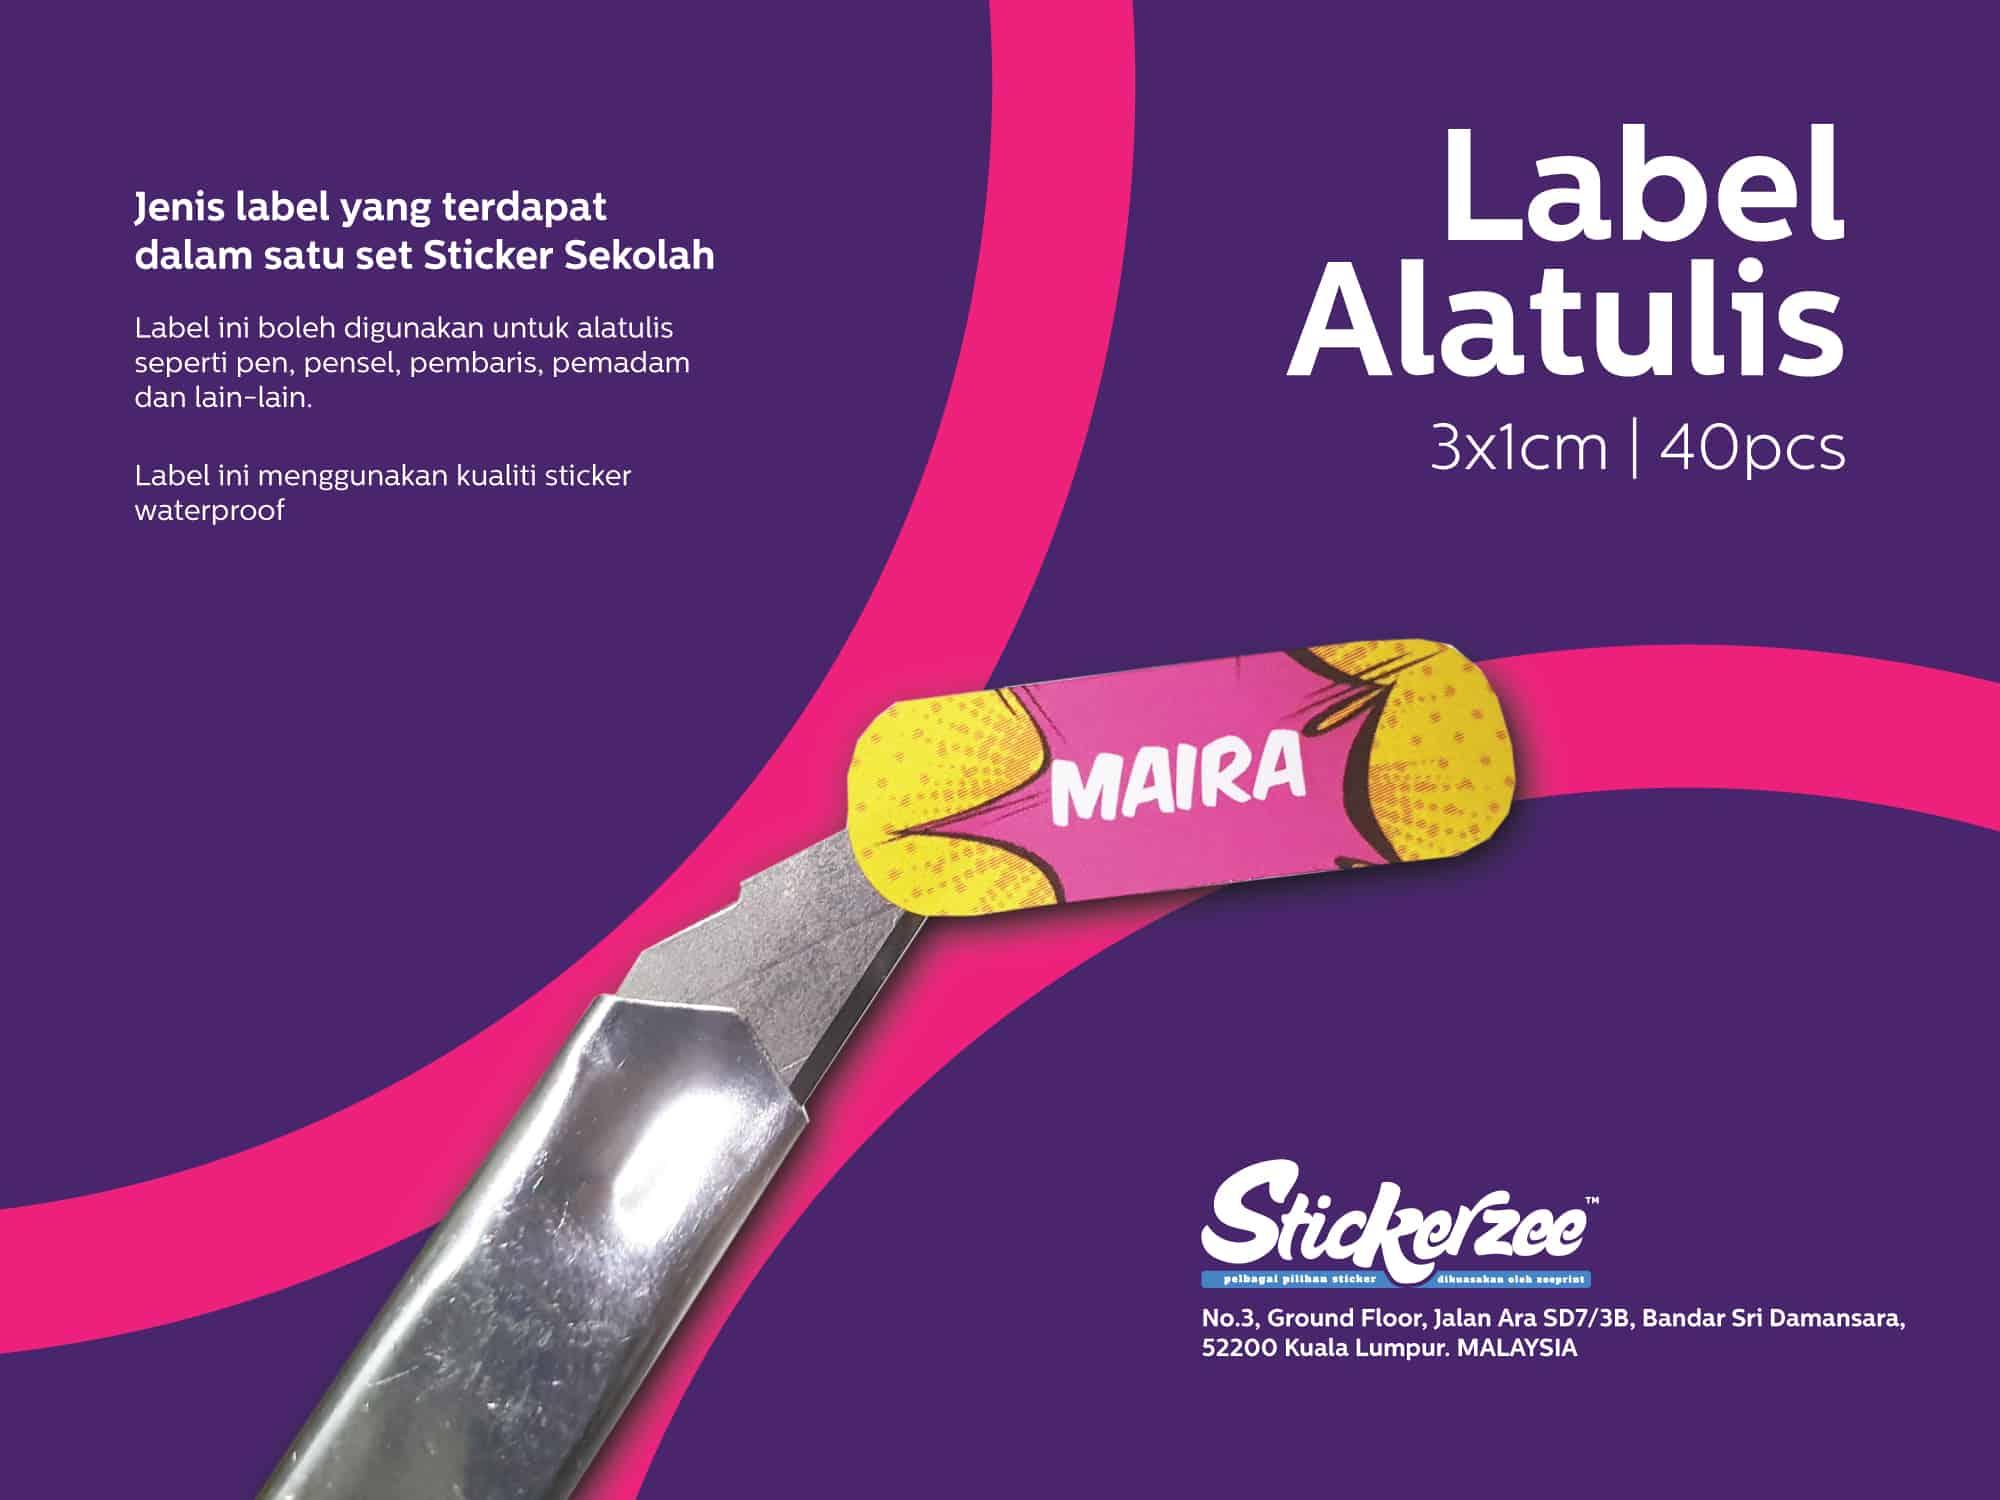 Sticker Sekolah - Label Alatulis